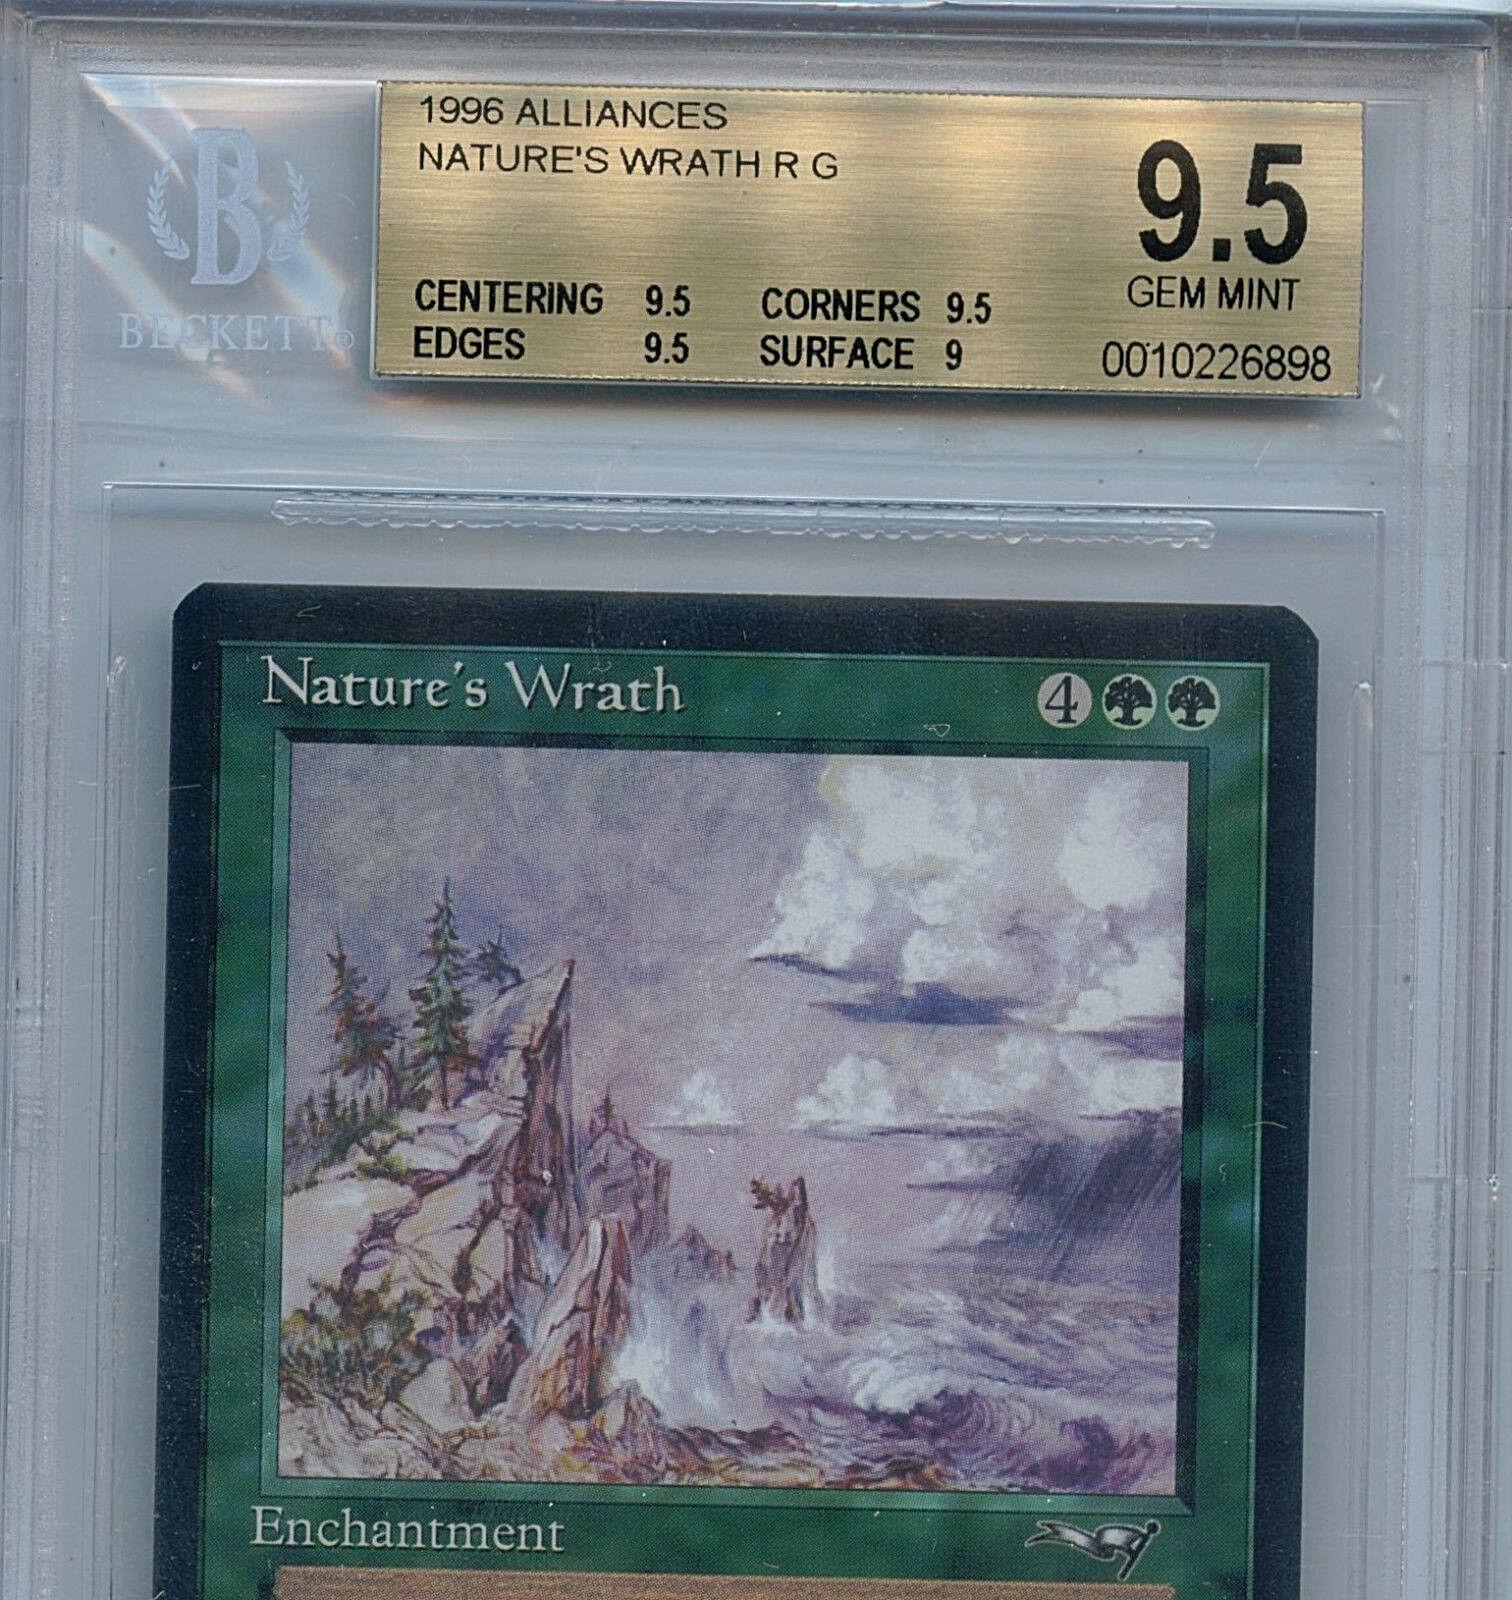 MTG Nature's Wrath BGS BGS BGS 9.5 Gem Mint Alliances Magic Card Amricons 6898 d2ddd5